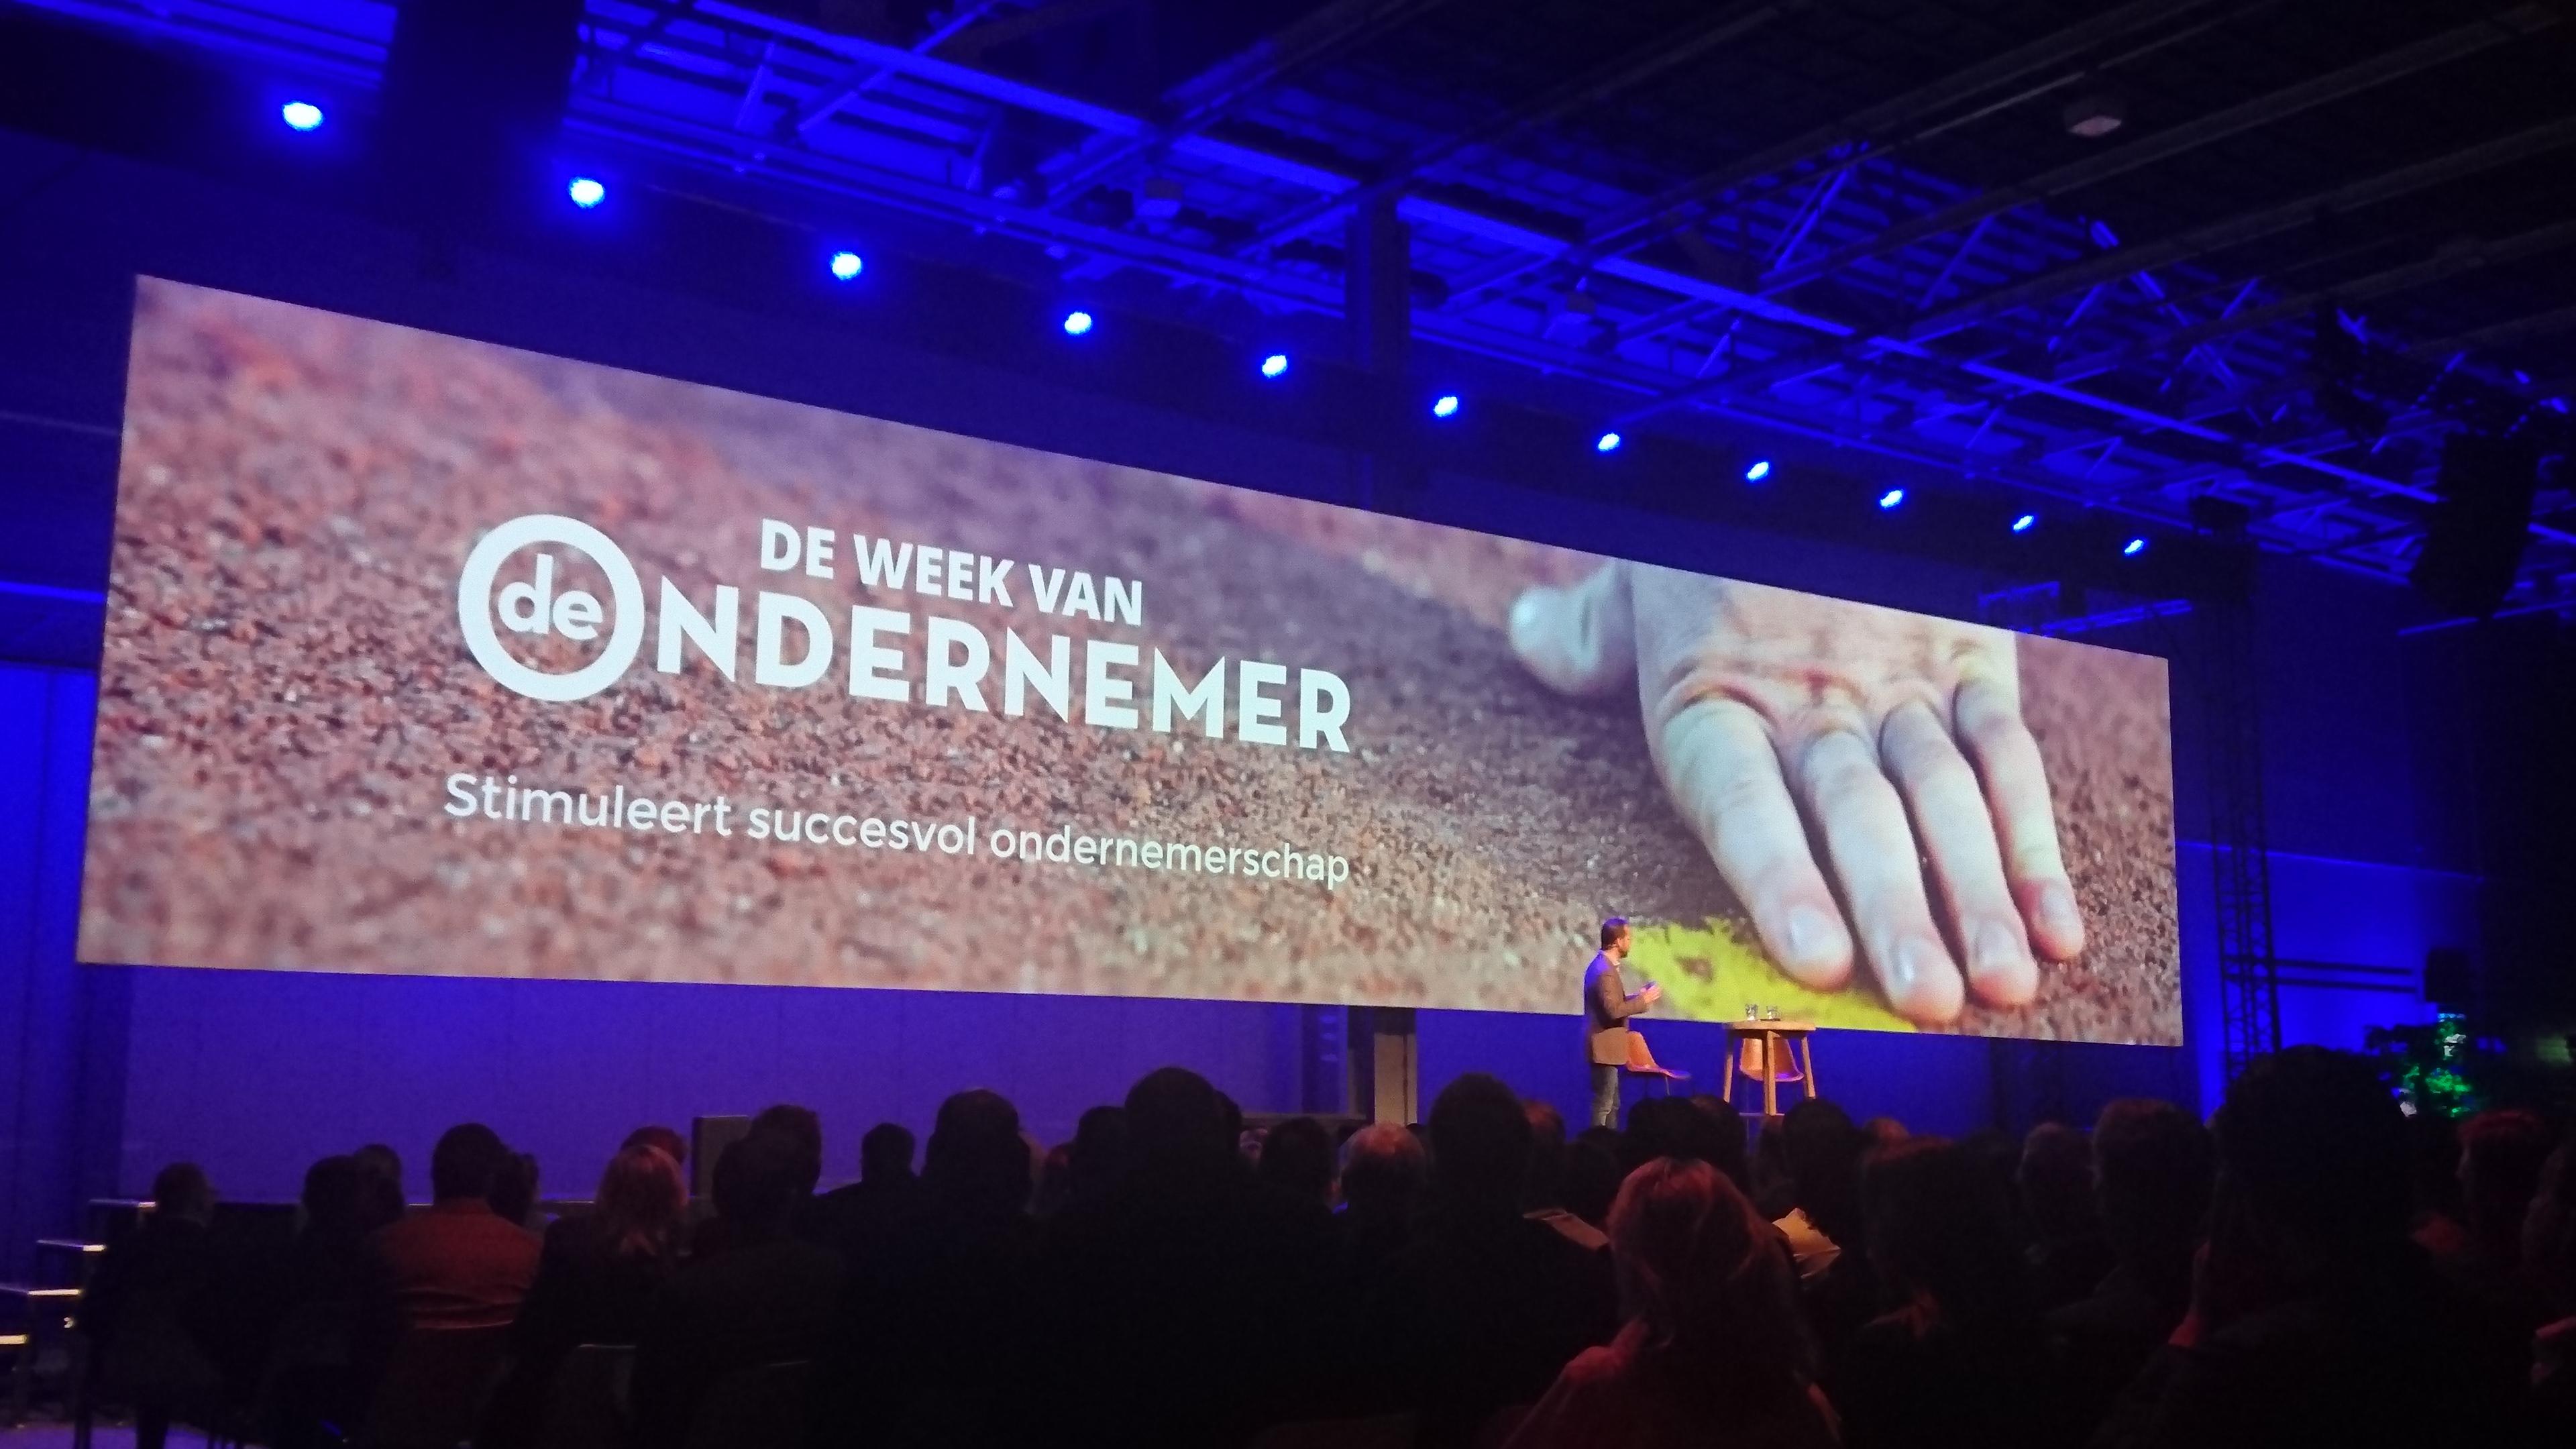 Week van de ondernemer